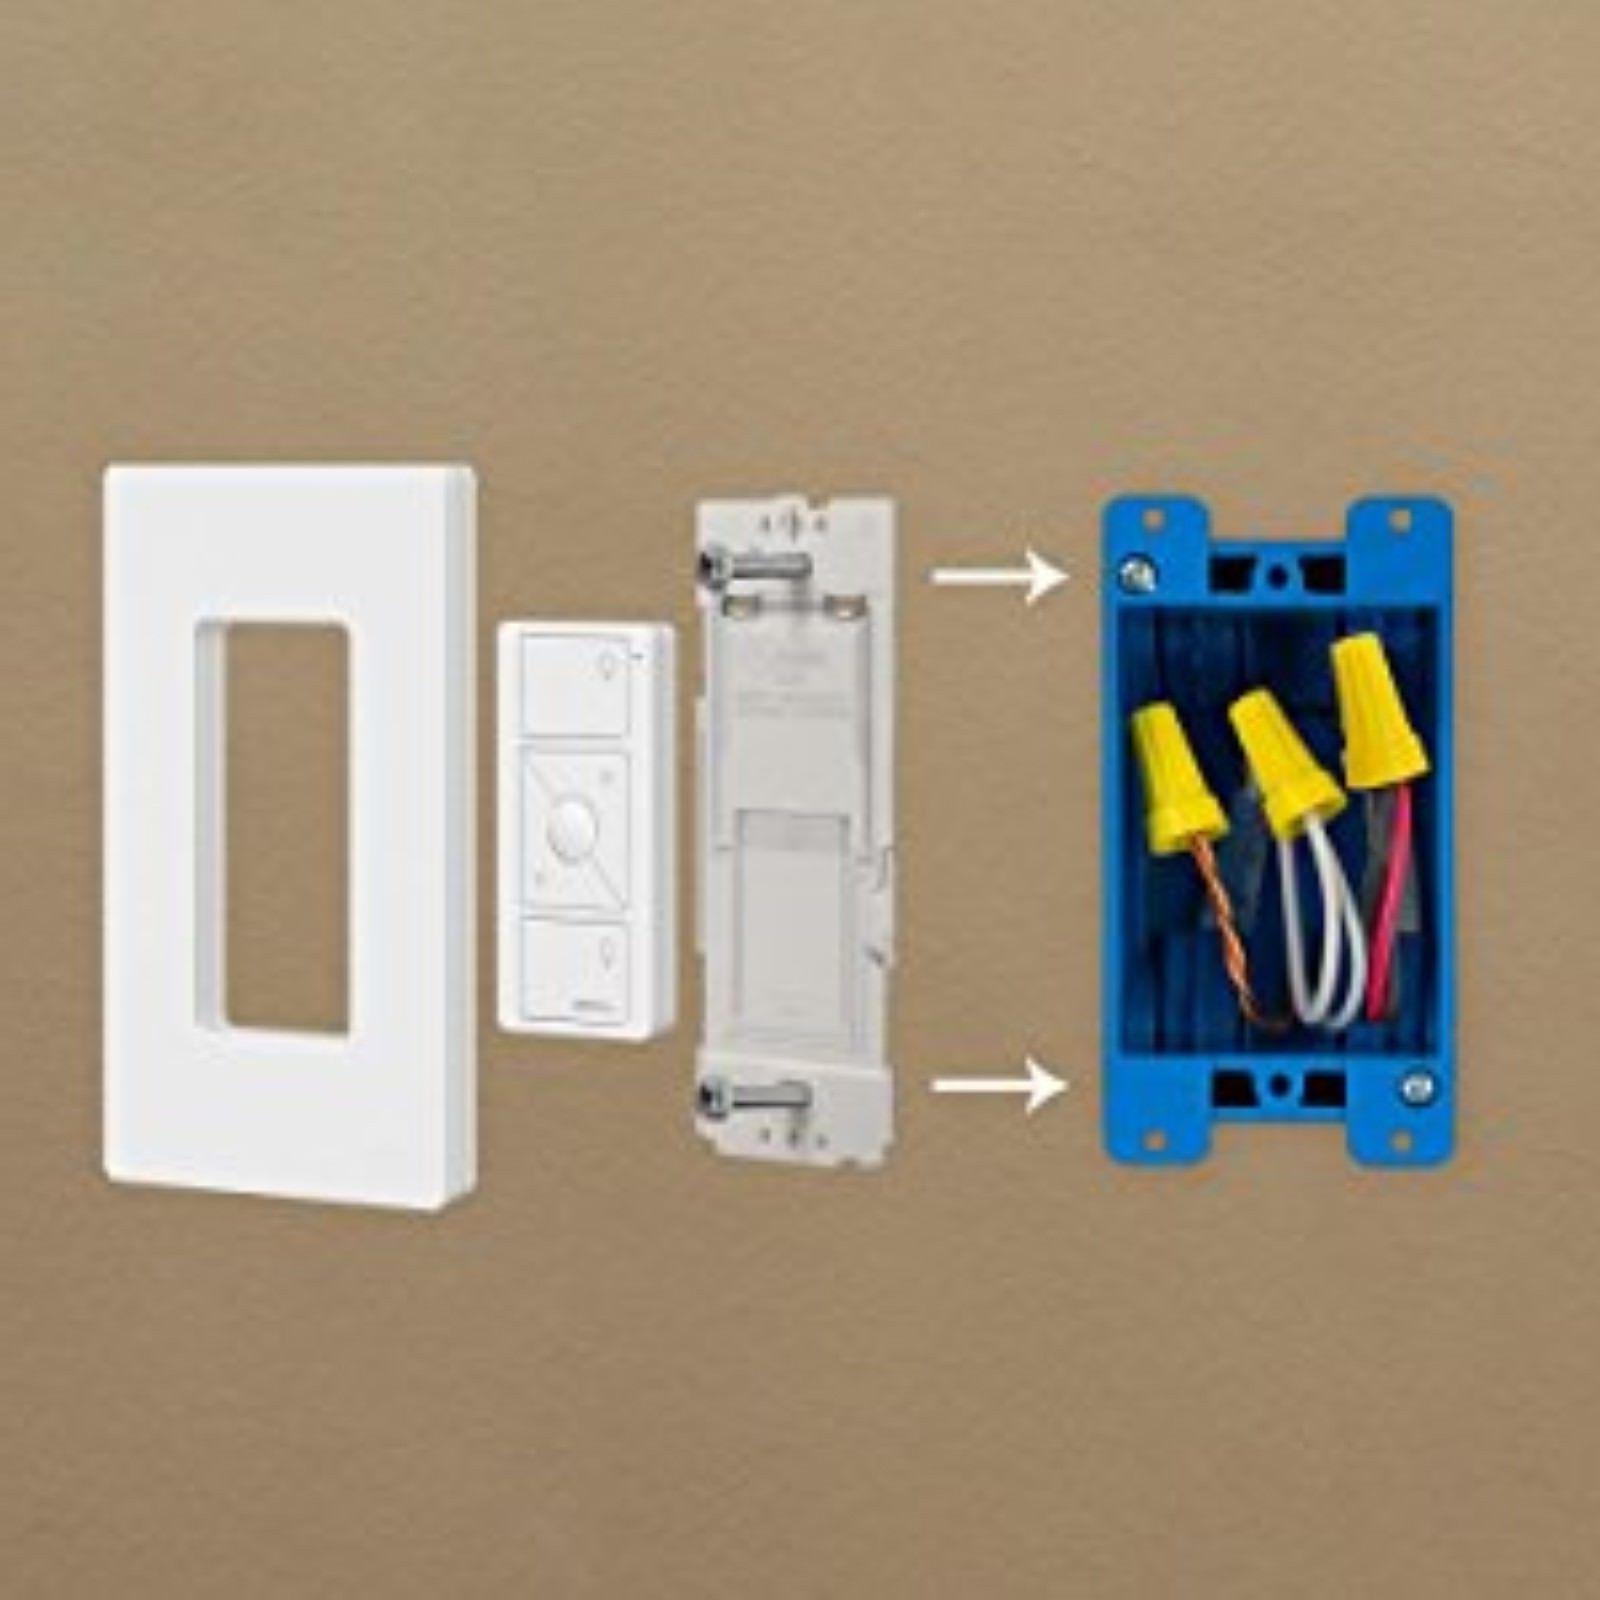 Wallplate Bracket Remote Lutron Caseta Wireless